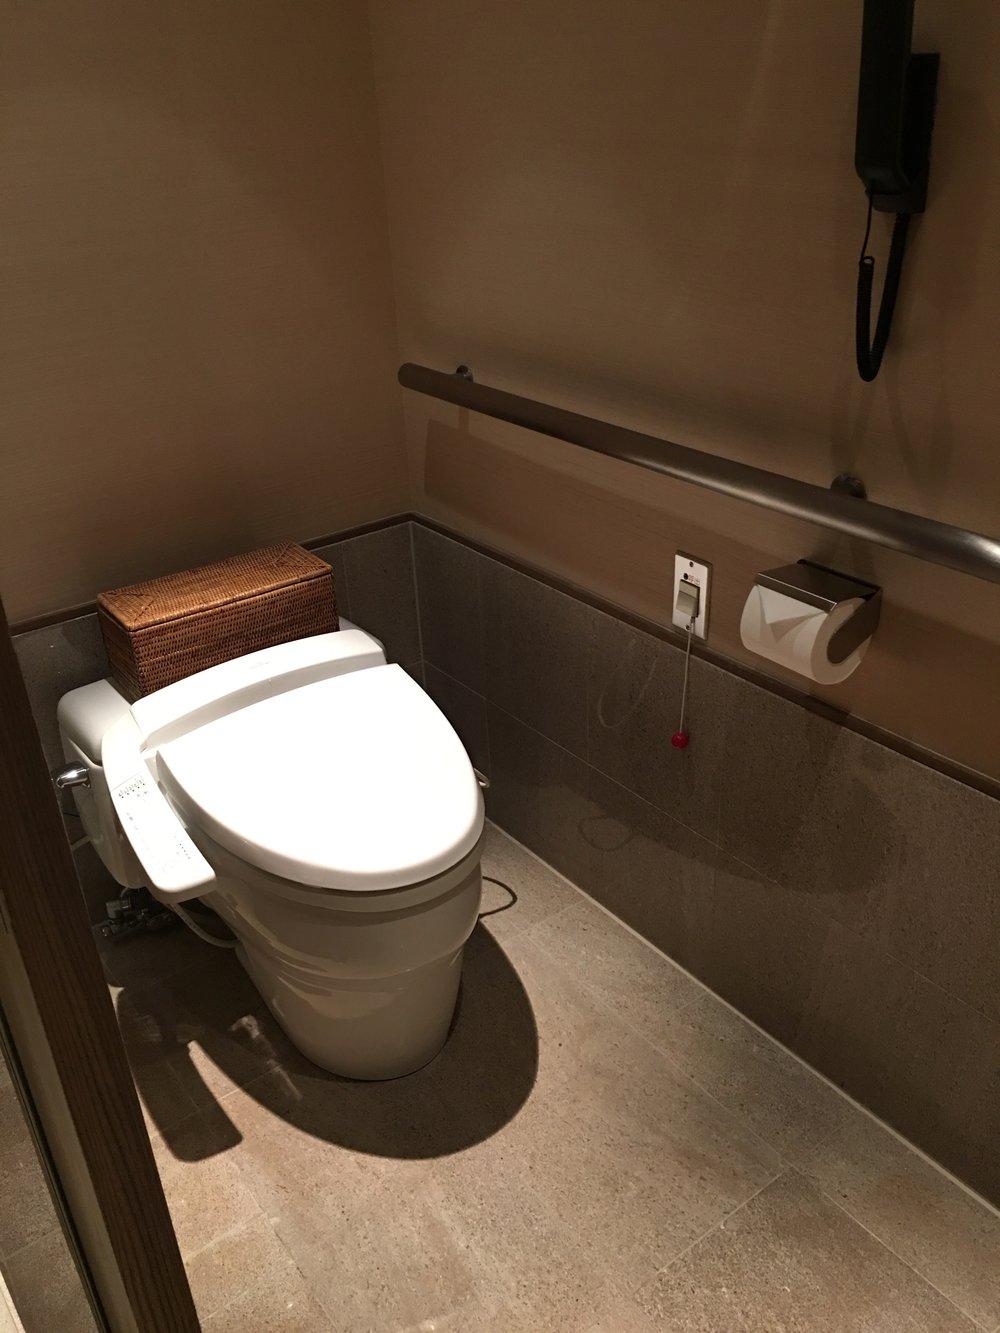 Hotel toilet in the Park Hyatt, Tokyo